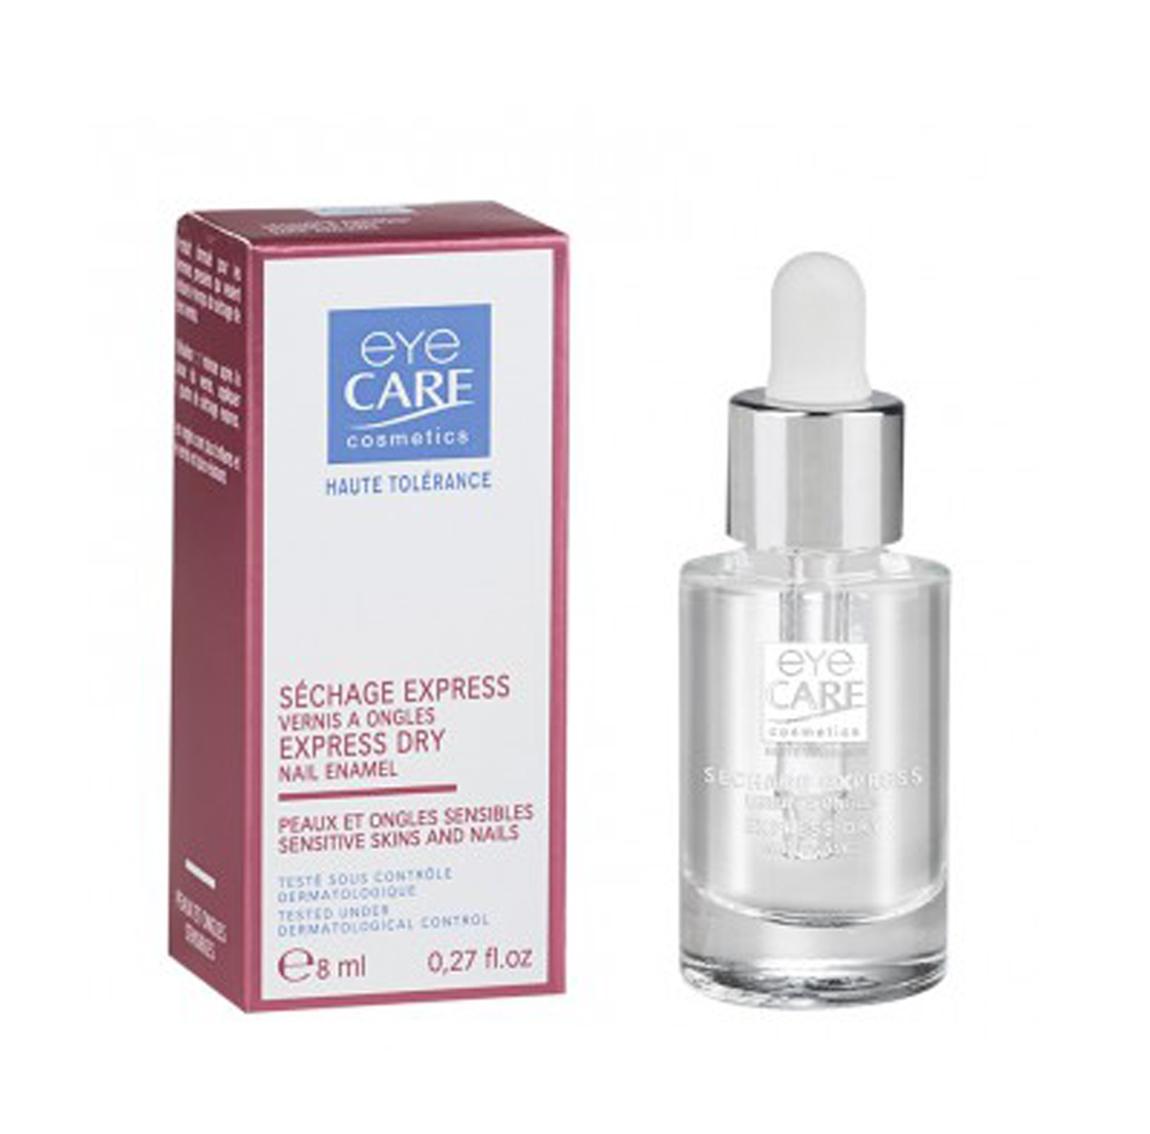 soin des ongles, goutte séchage, huile séchage, soin des ongles haute tolérance, Eye Care Cosmetics